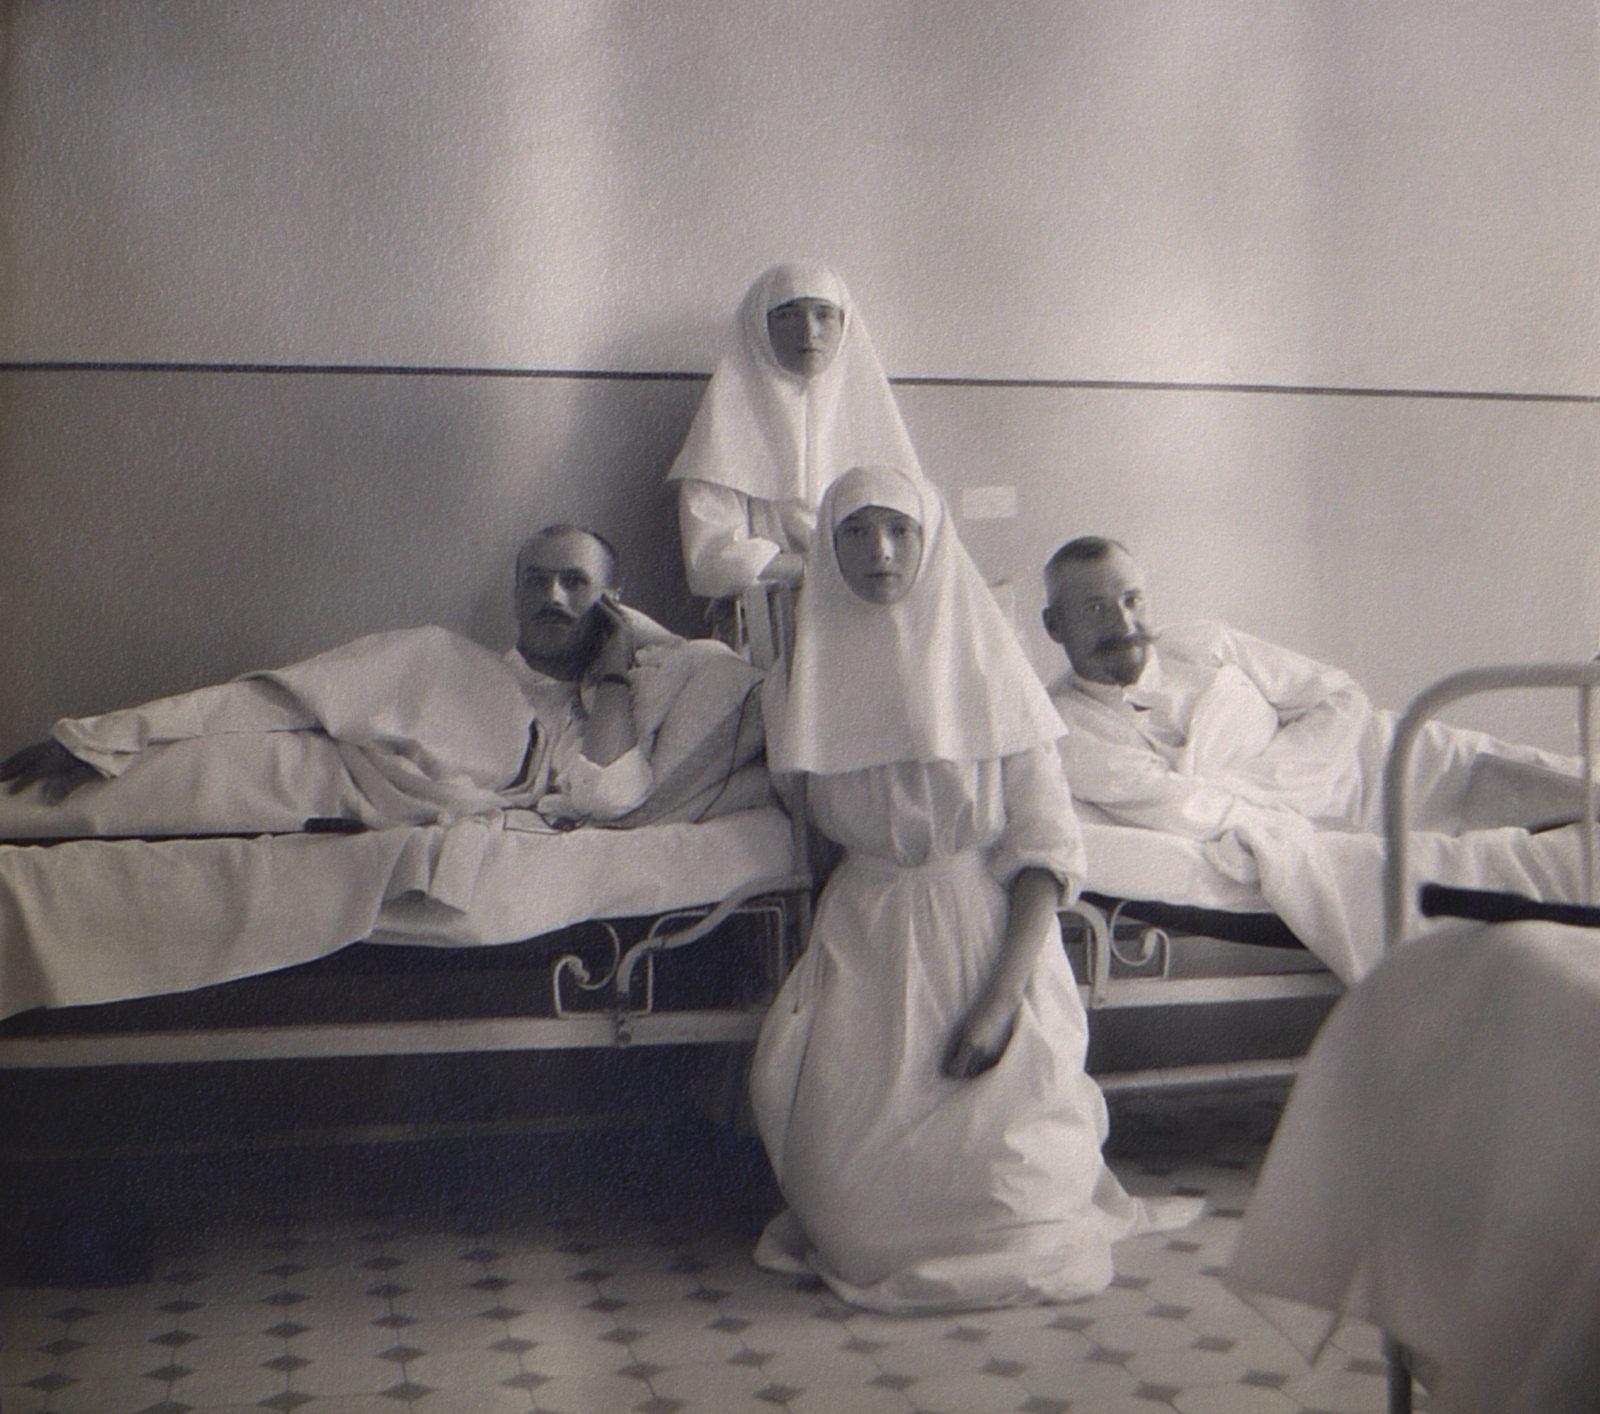 Grand Duchess Tatiana Nikolaevna, Grand Duchess Olga Nikolaevna, in hospital